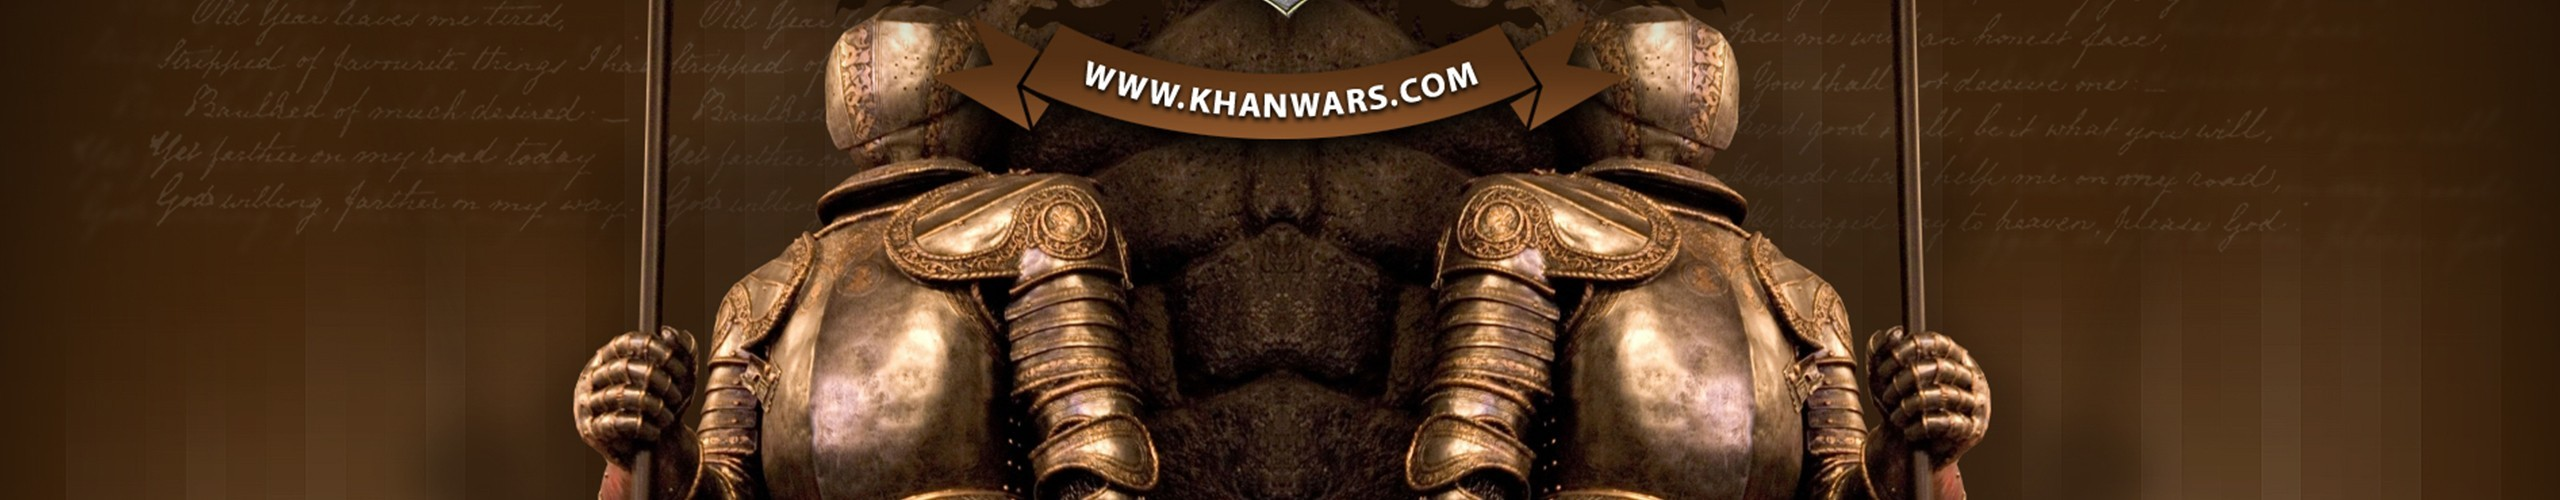 Los Khanes